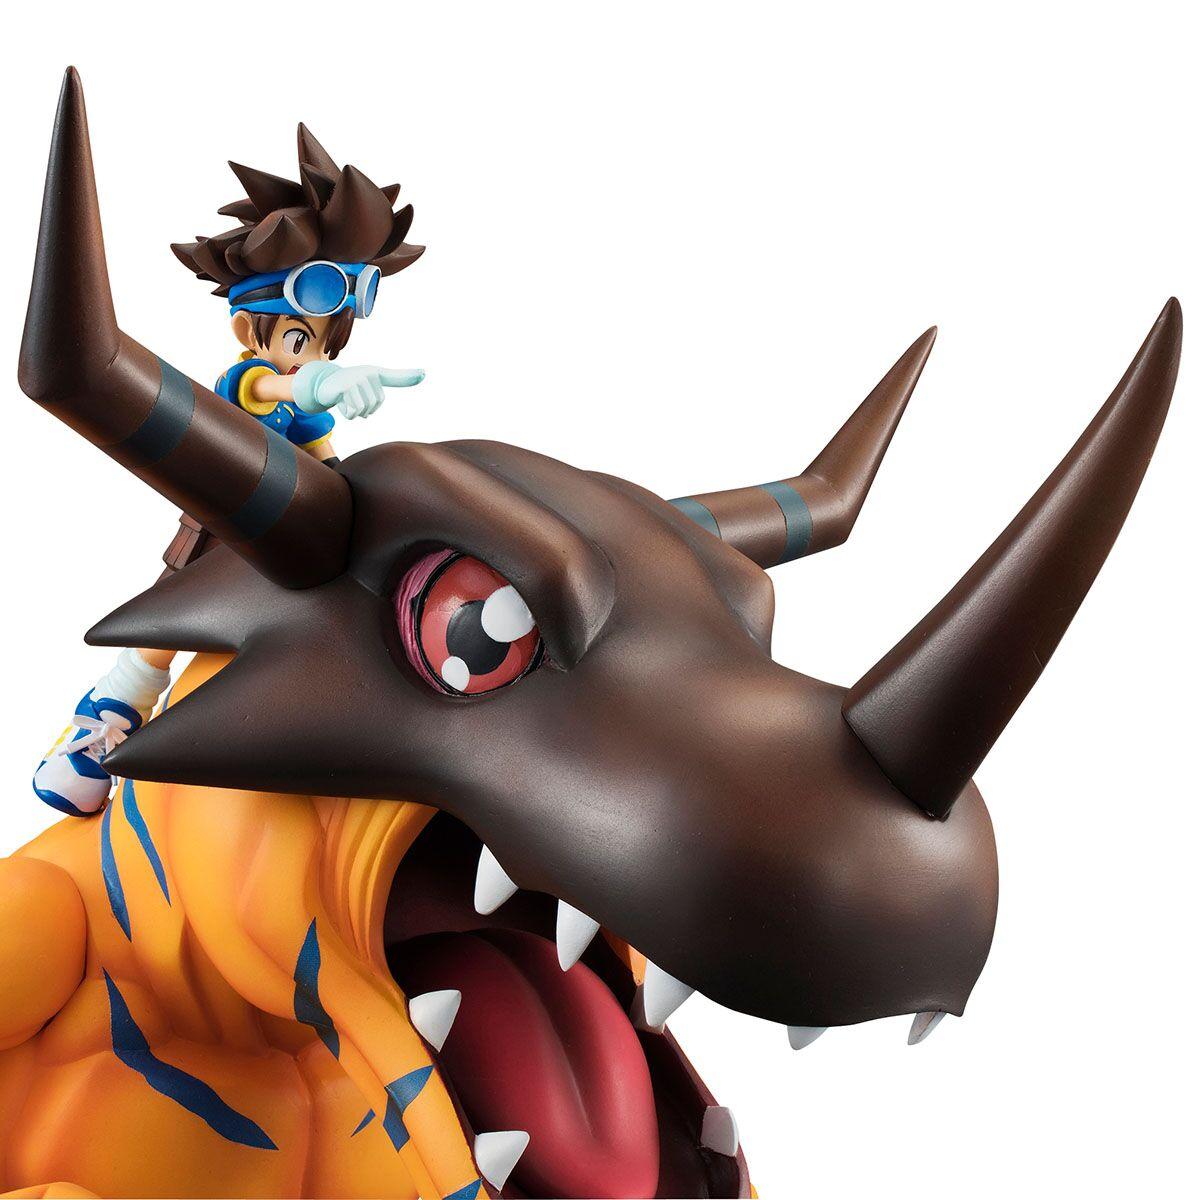 Erotic Digimon Fanfiction